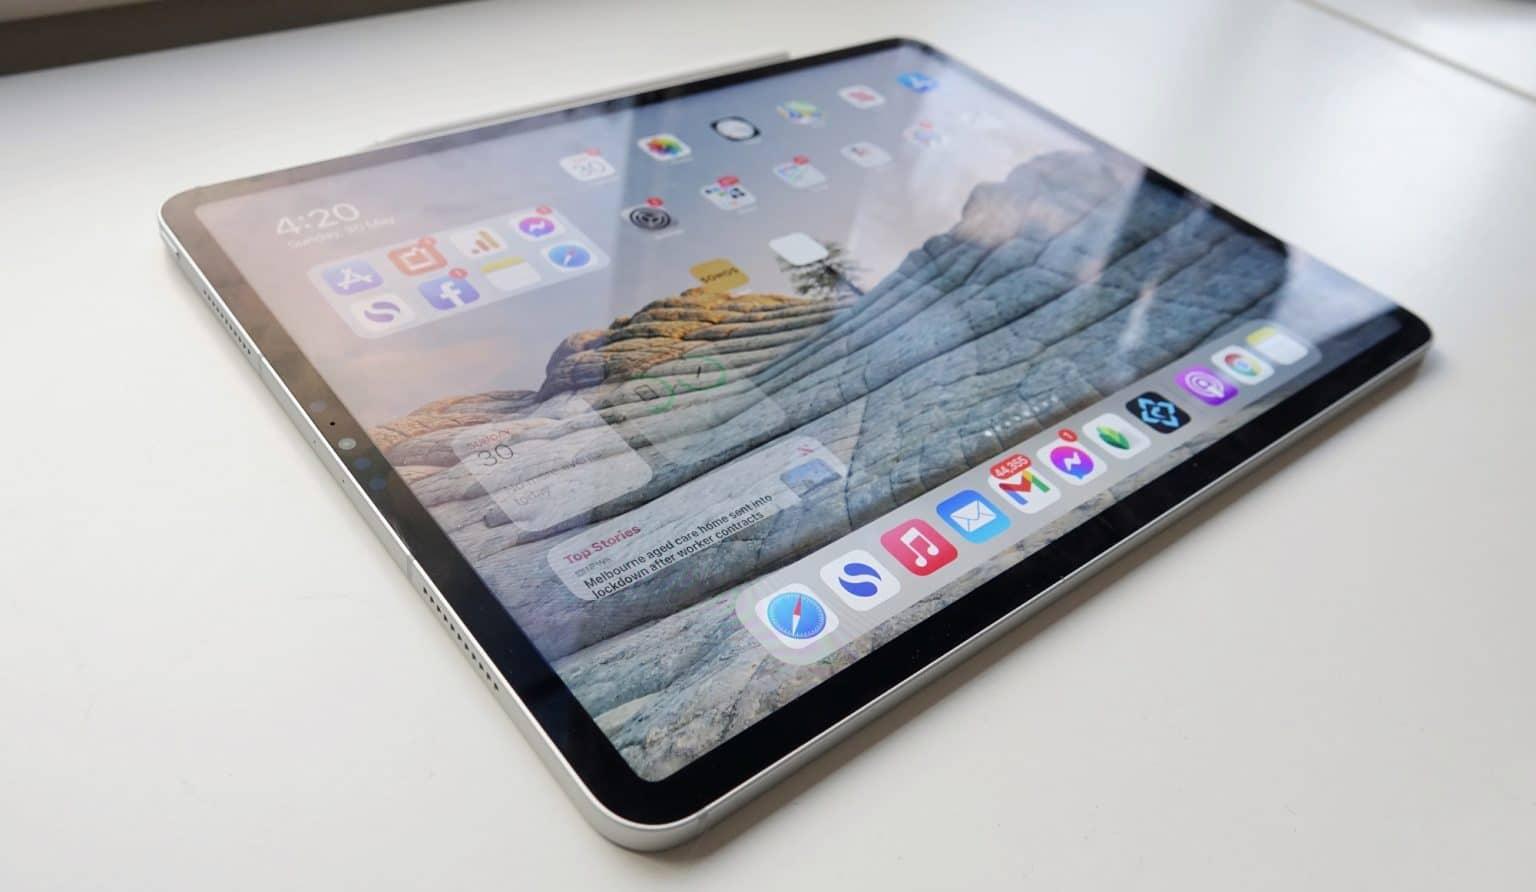 Apple iPad Pro 12.9 review (2021, M1 iPad Pro) - Pickr